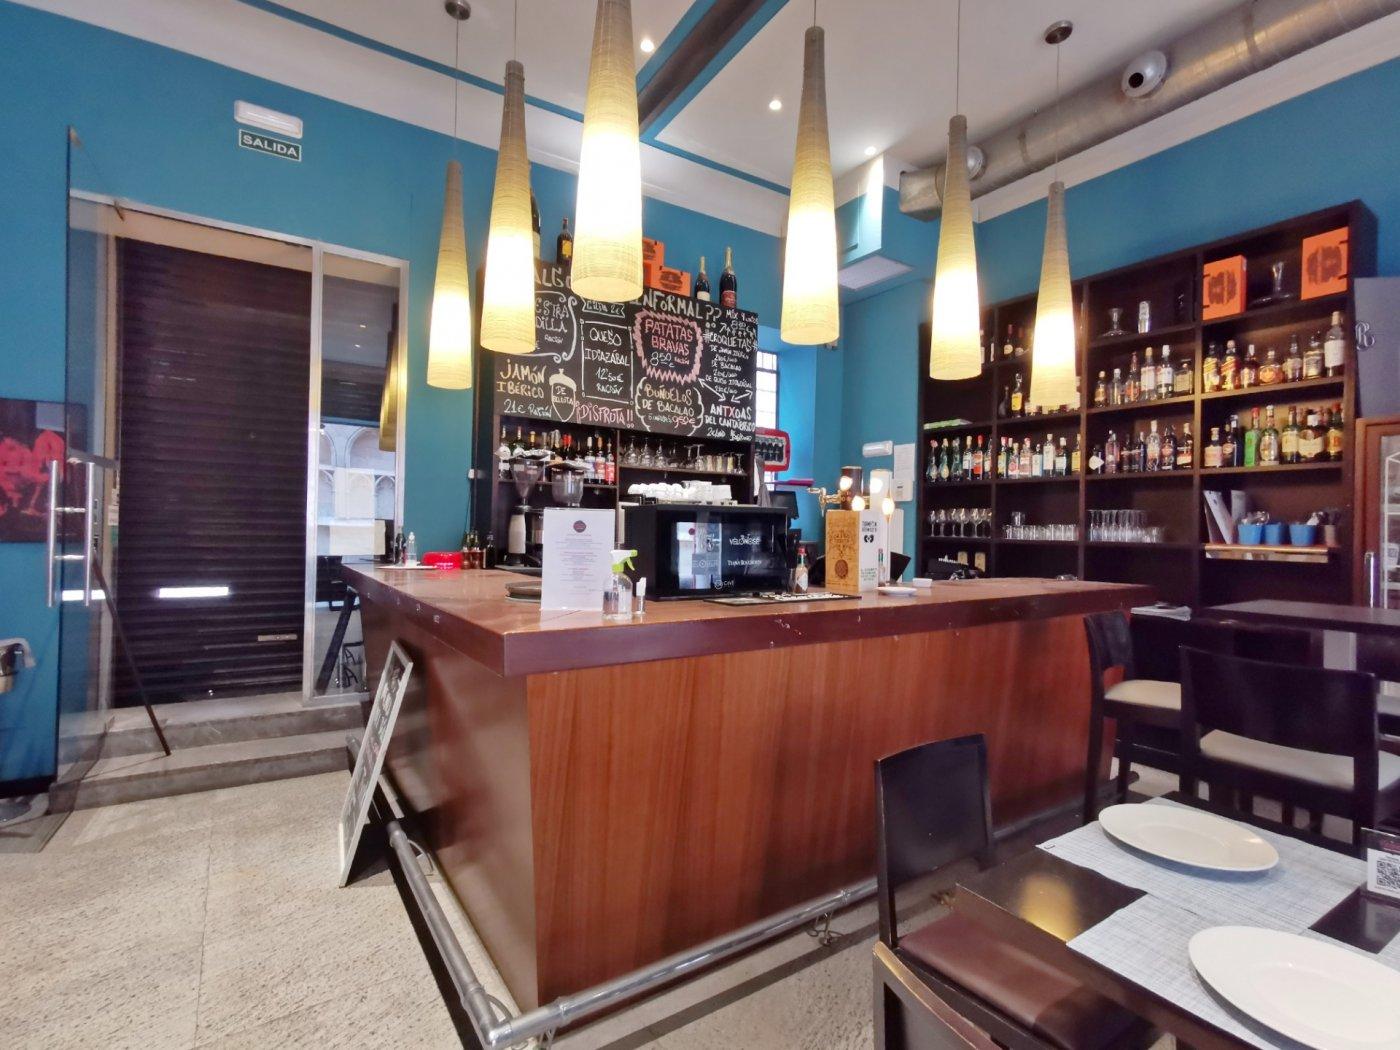 Se traspasa restaurante en centro de palma - imagenInmueble3